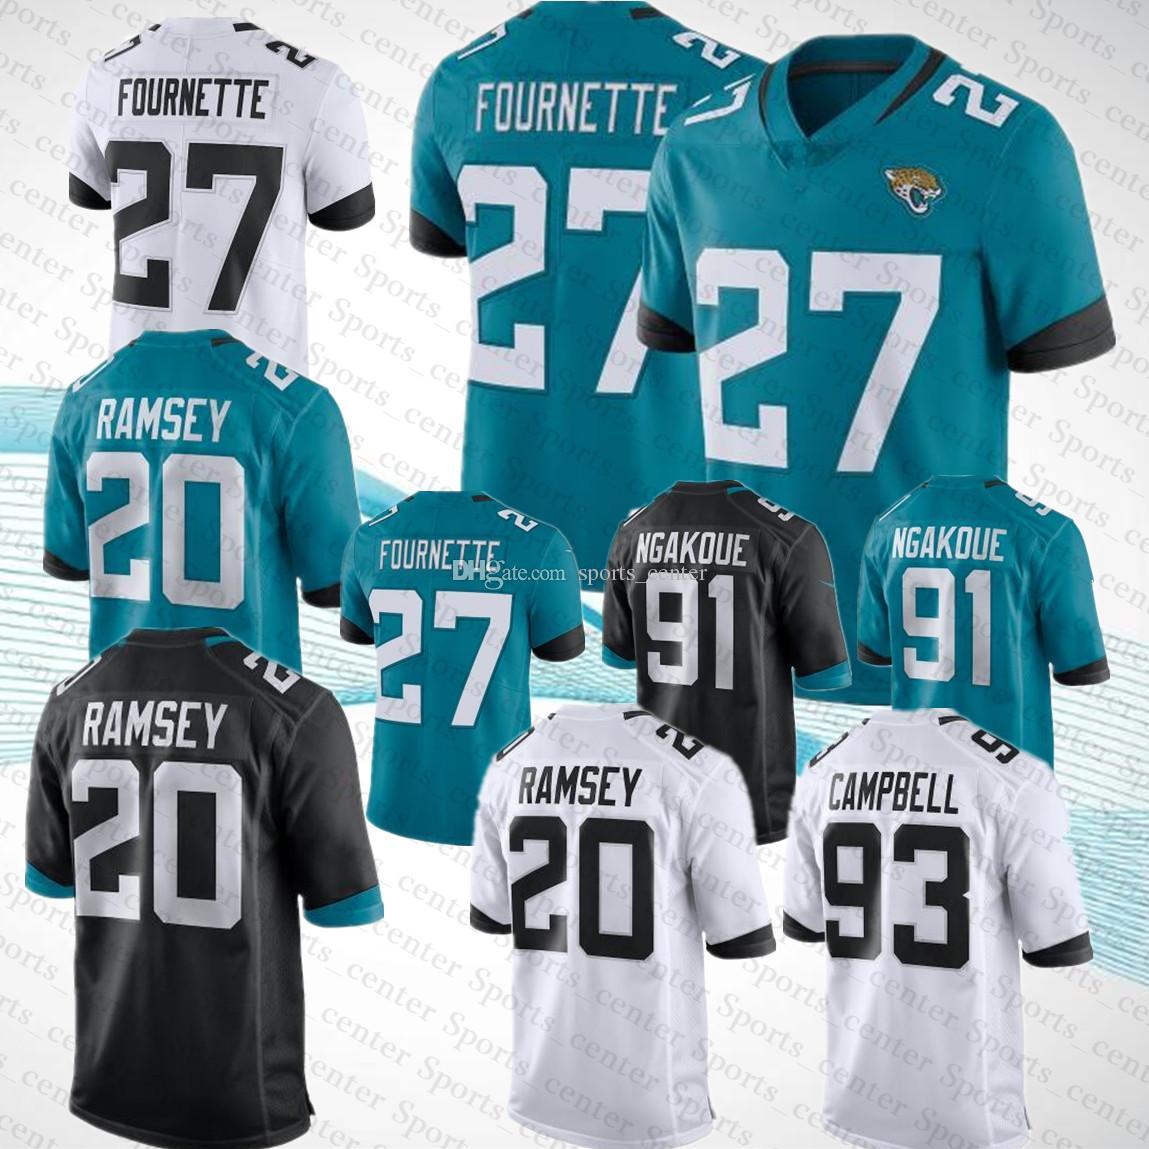 Compre Mens Jacksonville Jaguars Jerseys 20 Jalen Ramsey 91 Camisas De  Futebol De Leonard Fournett 93 Calvin Campbell 50 Yannick Ngakoue 27 De  Sports_center ...